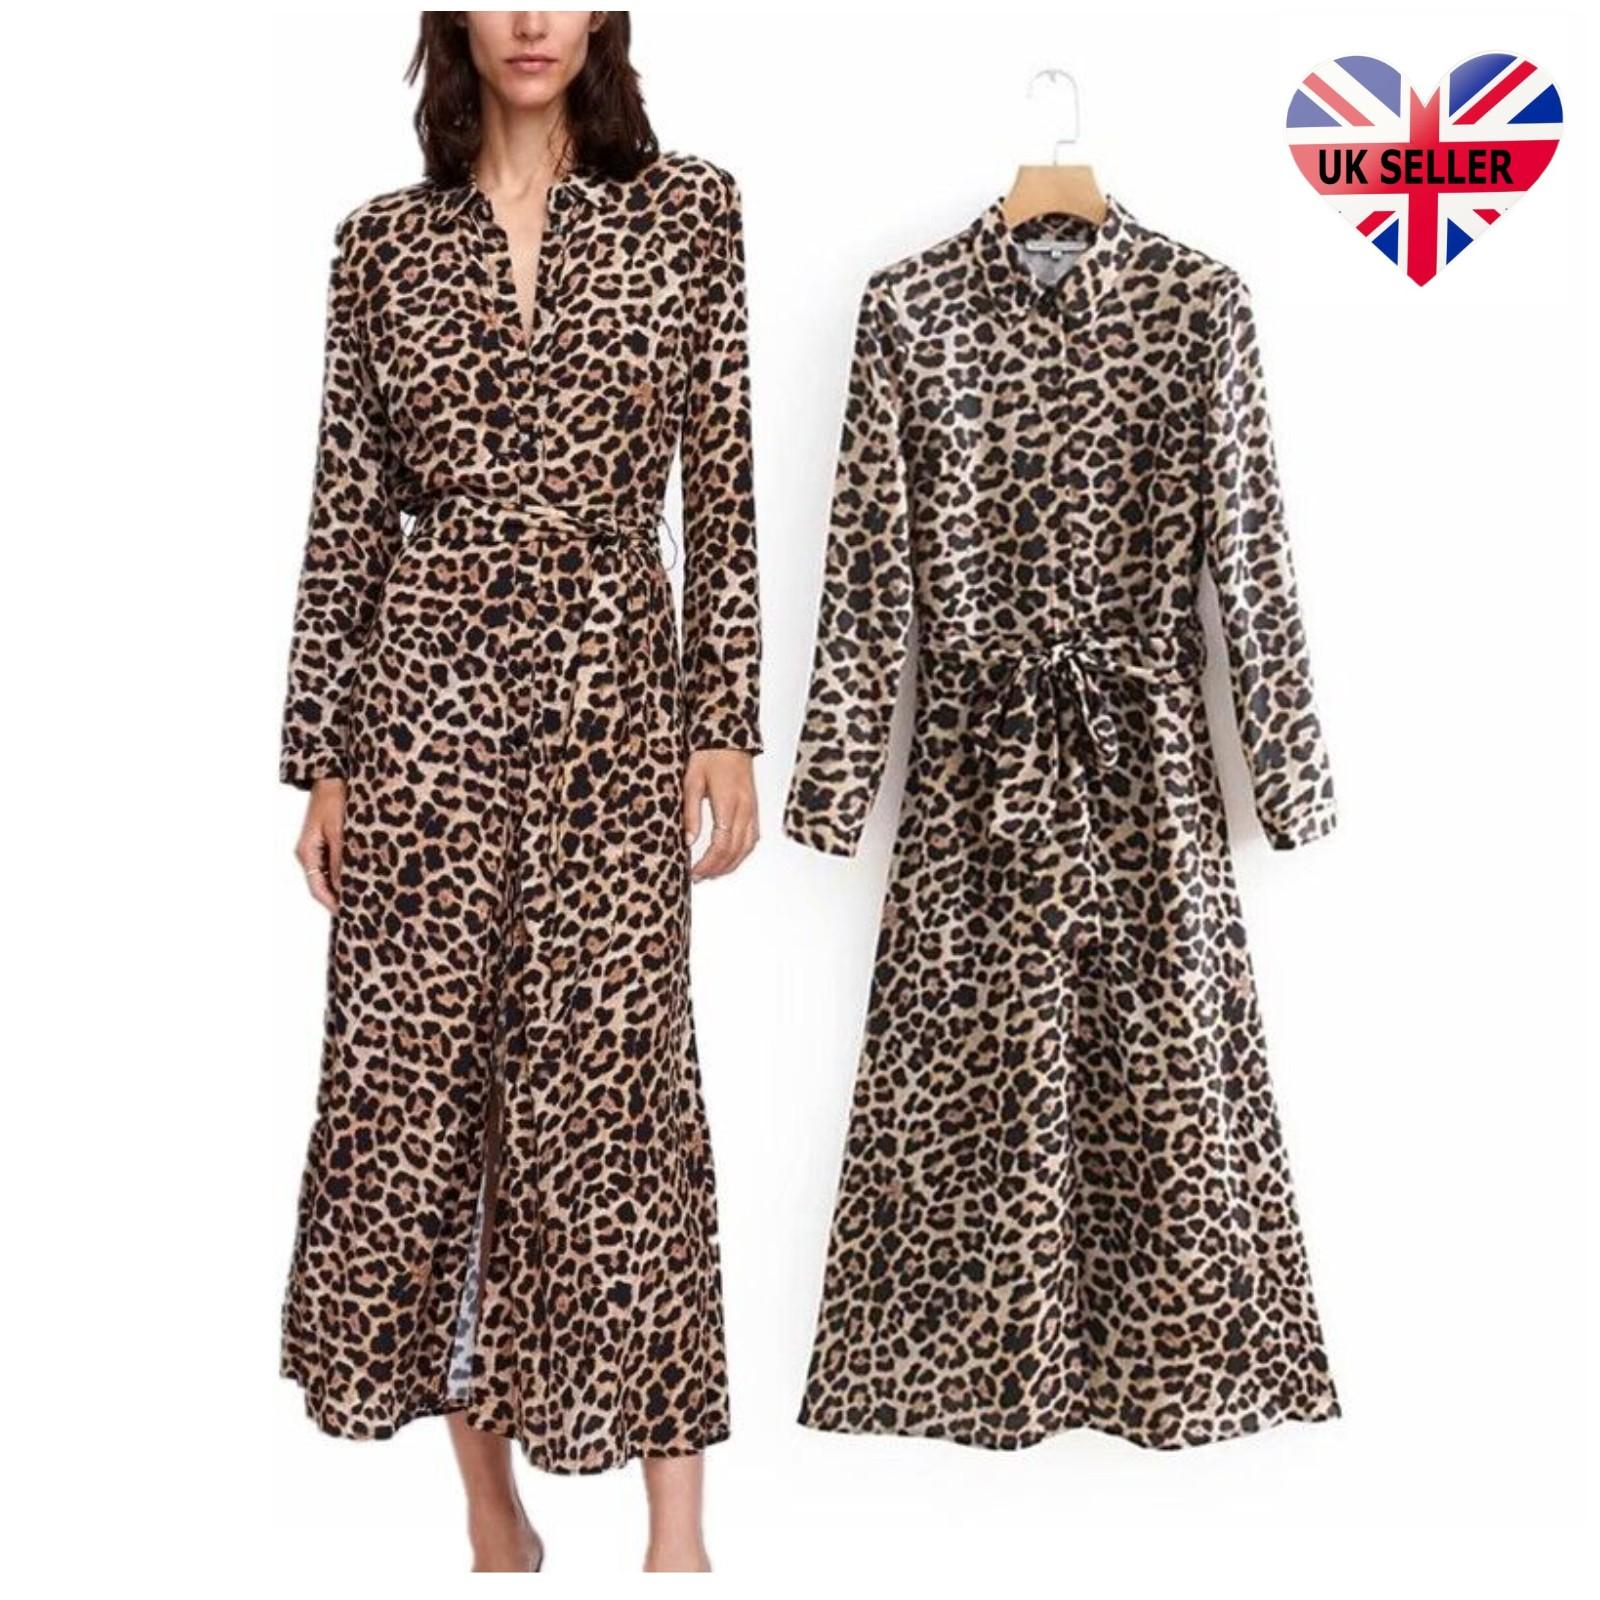 Retro Womens Leopard Print Shirt Dress Belt Lapel Maxi Long Sleeve Tops  Gifts UK 3a1ad2bf1f